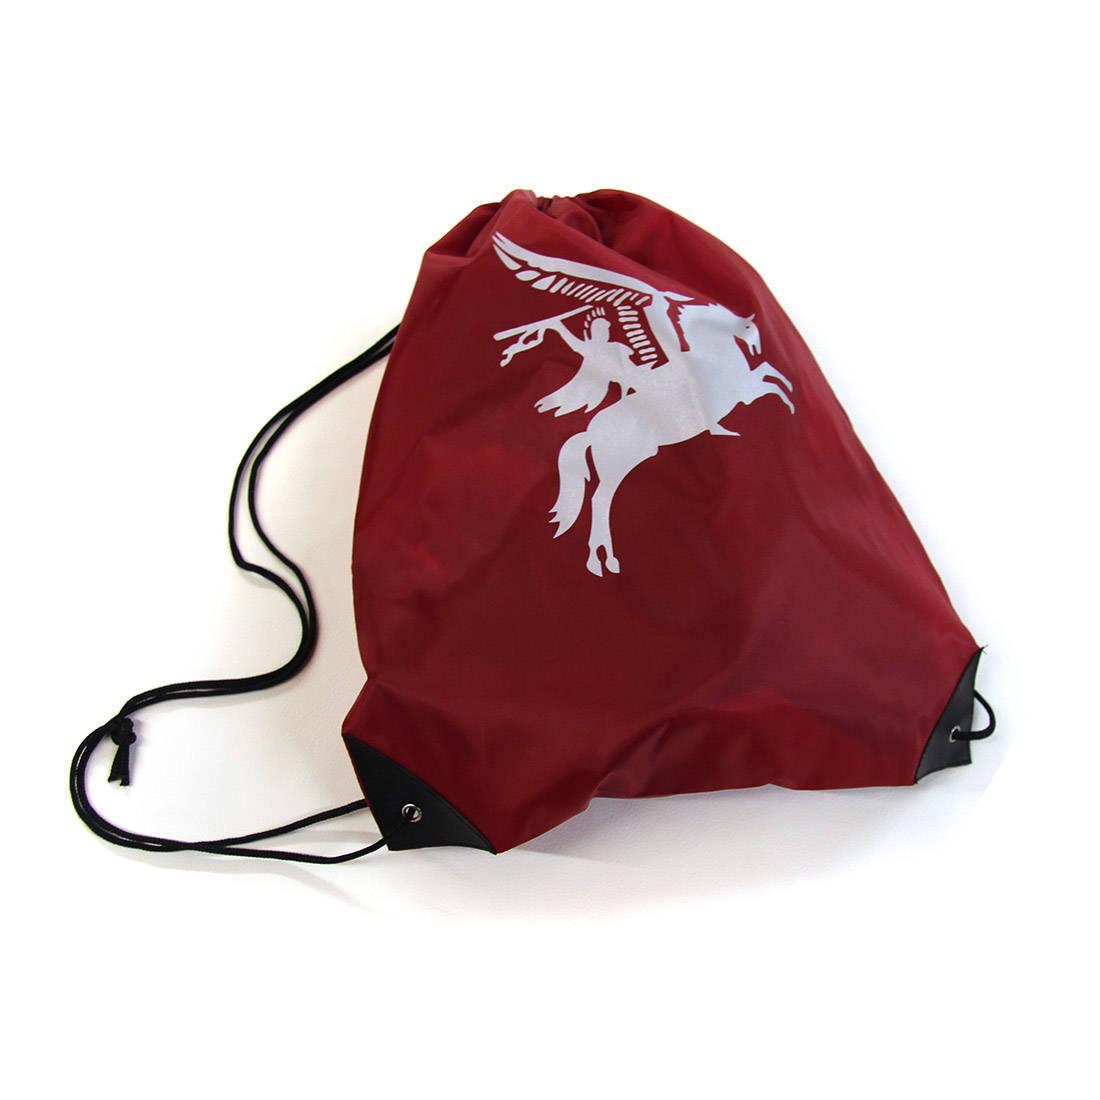 Maroon Drawstring Bag - Parachute Regiment or Pegasus - The ...